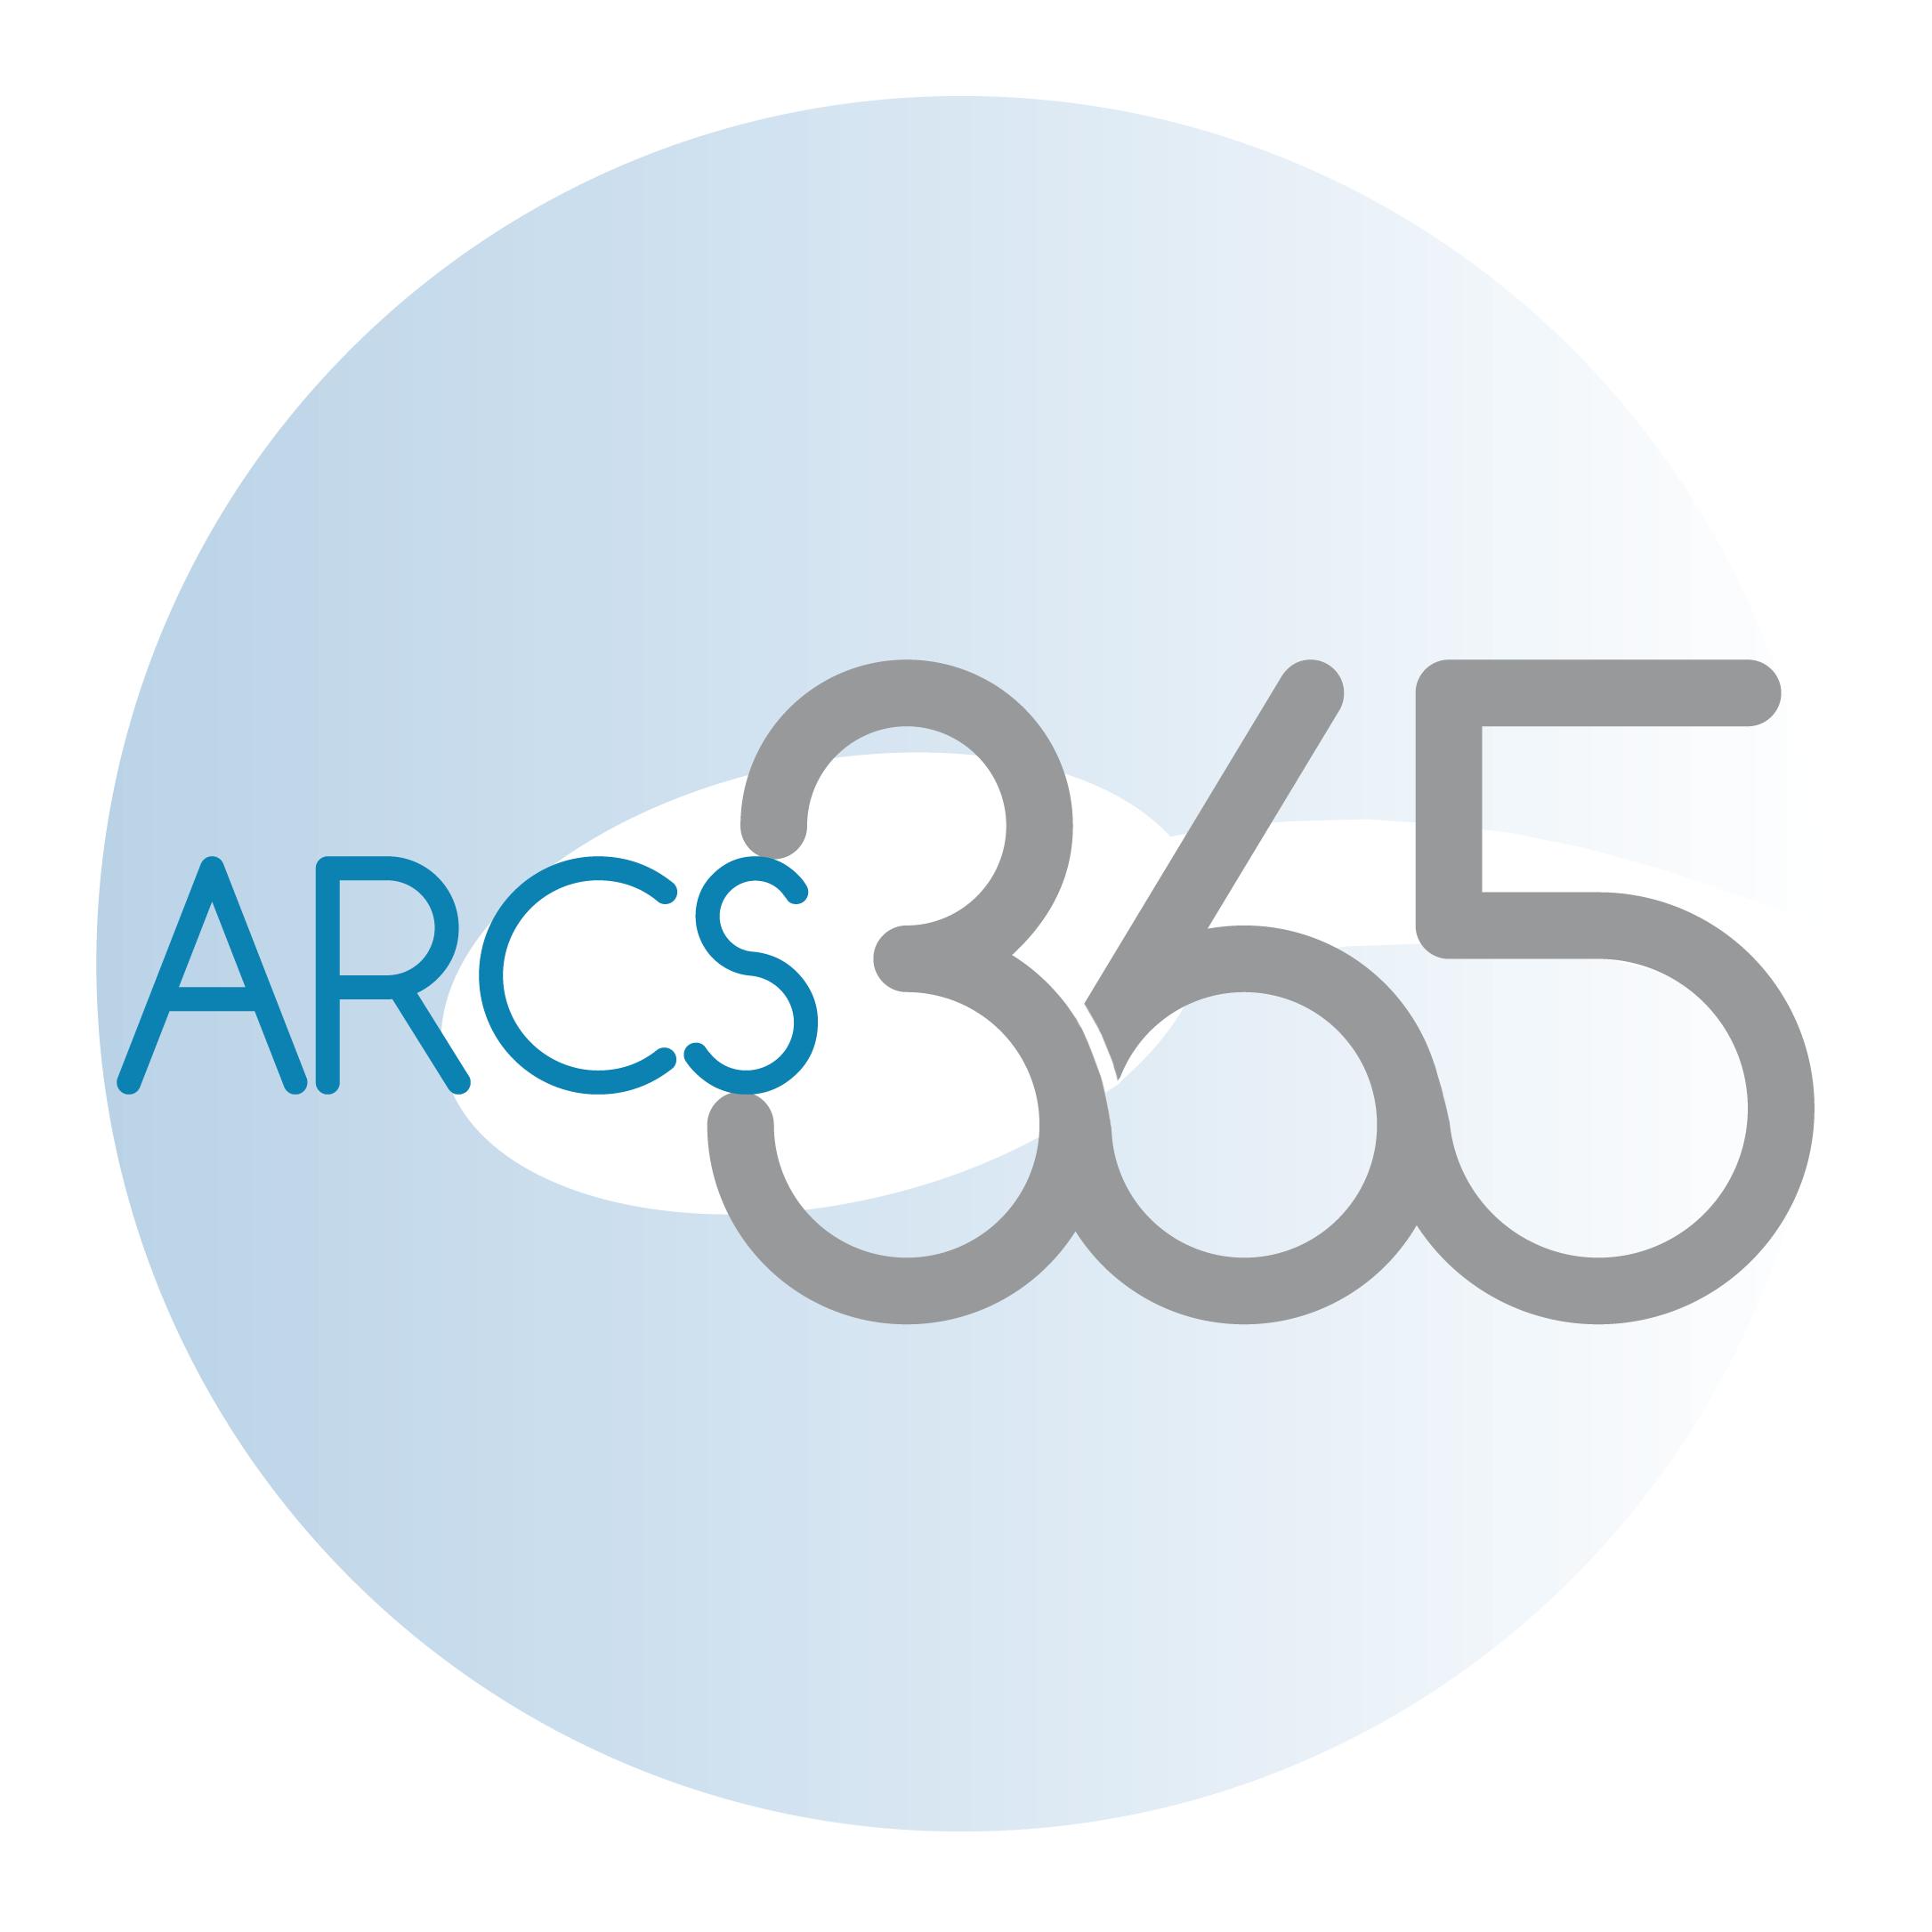 ARCS365